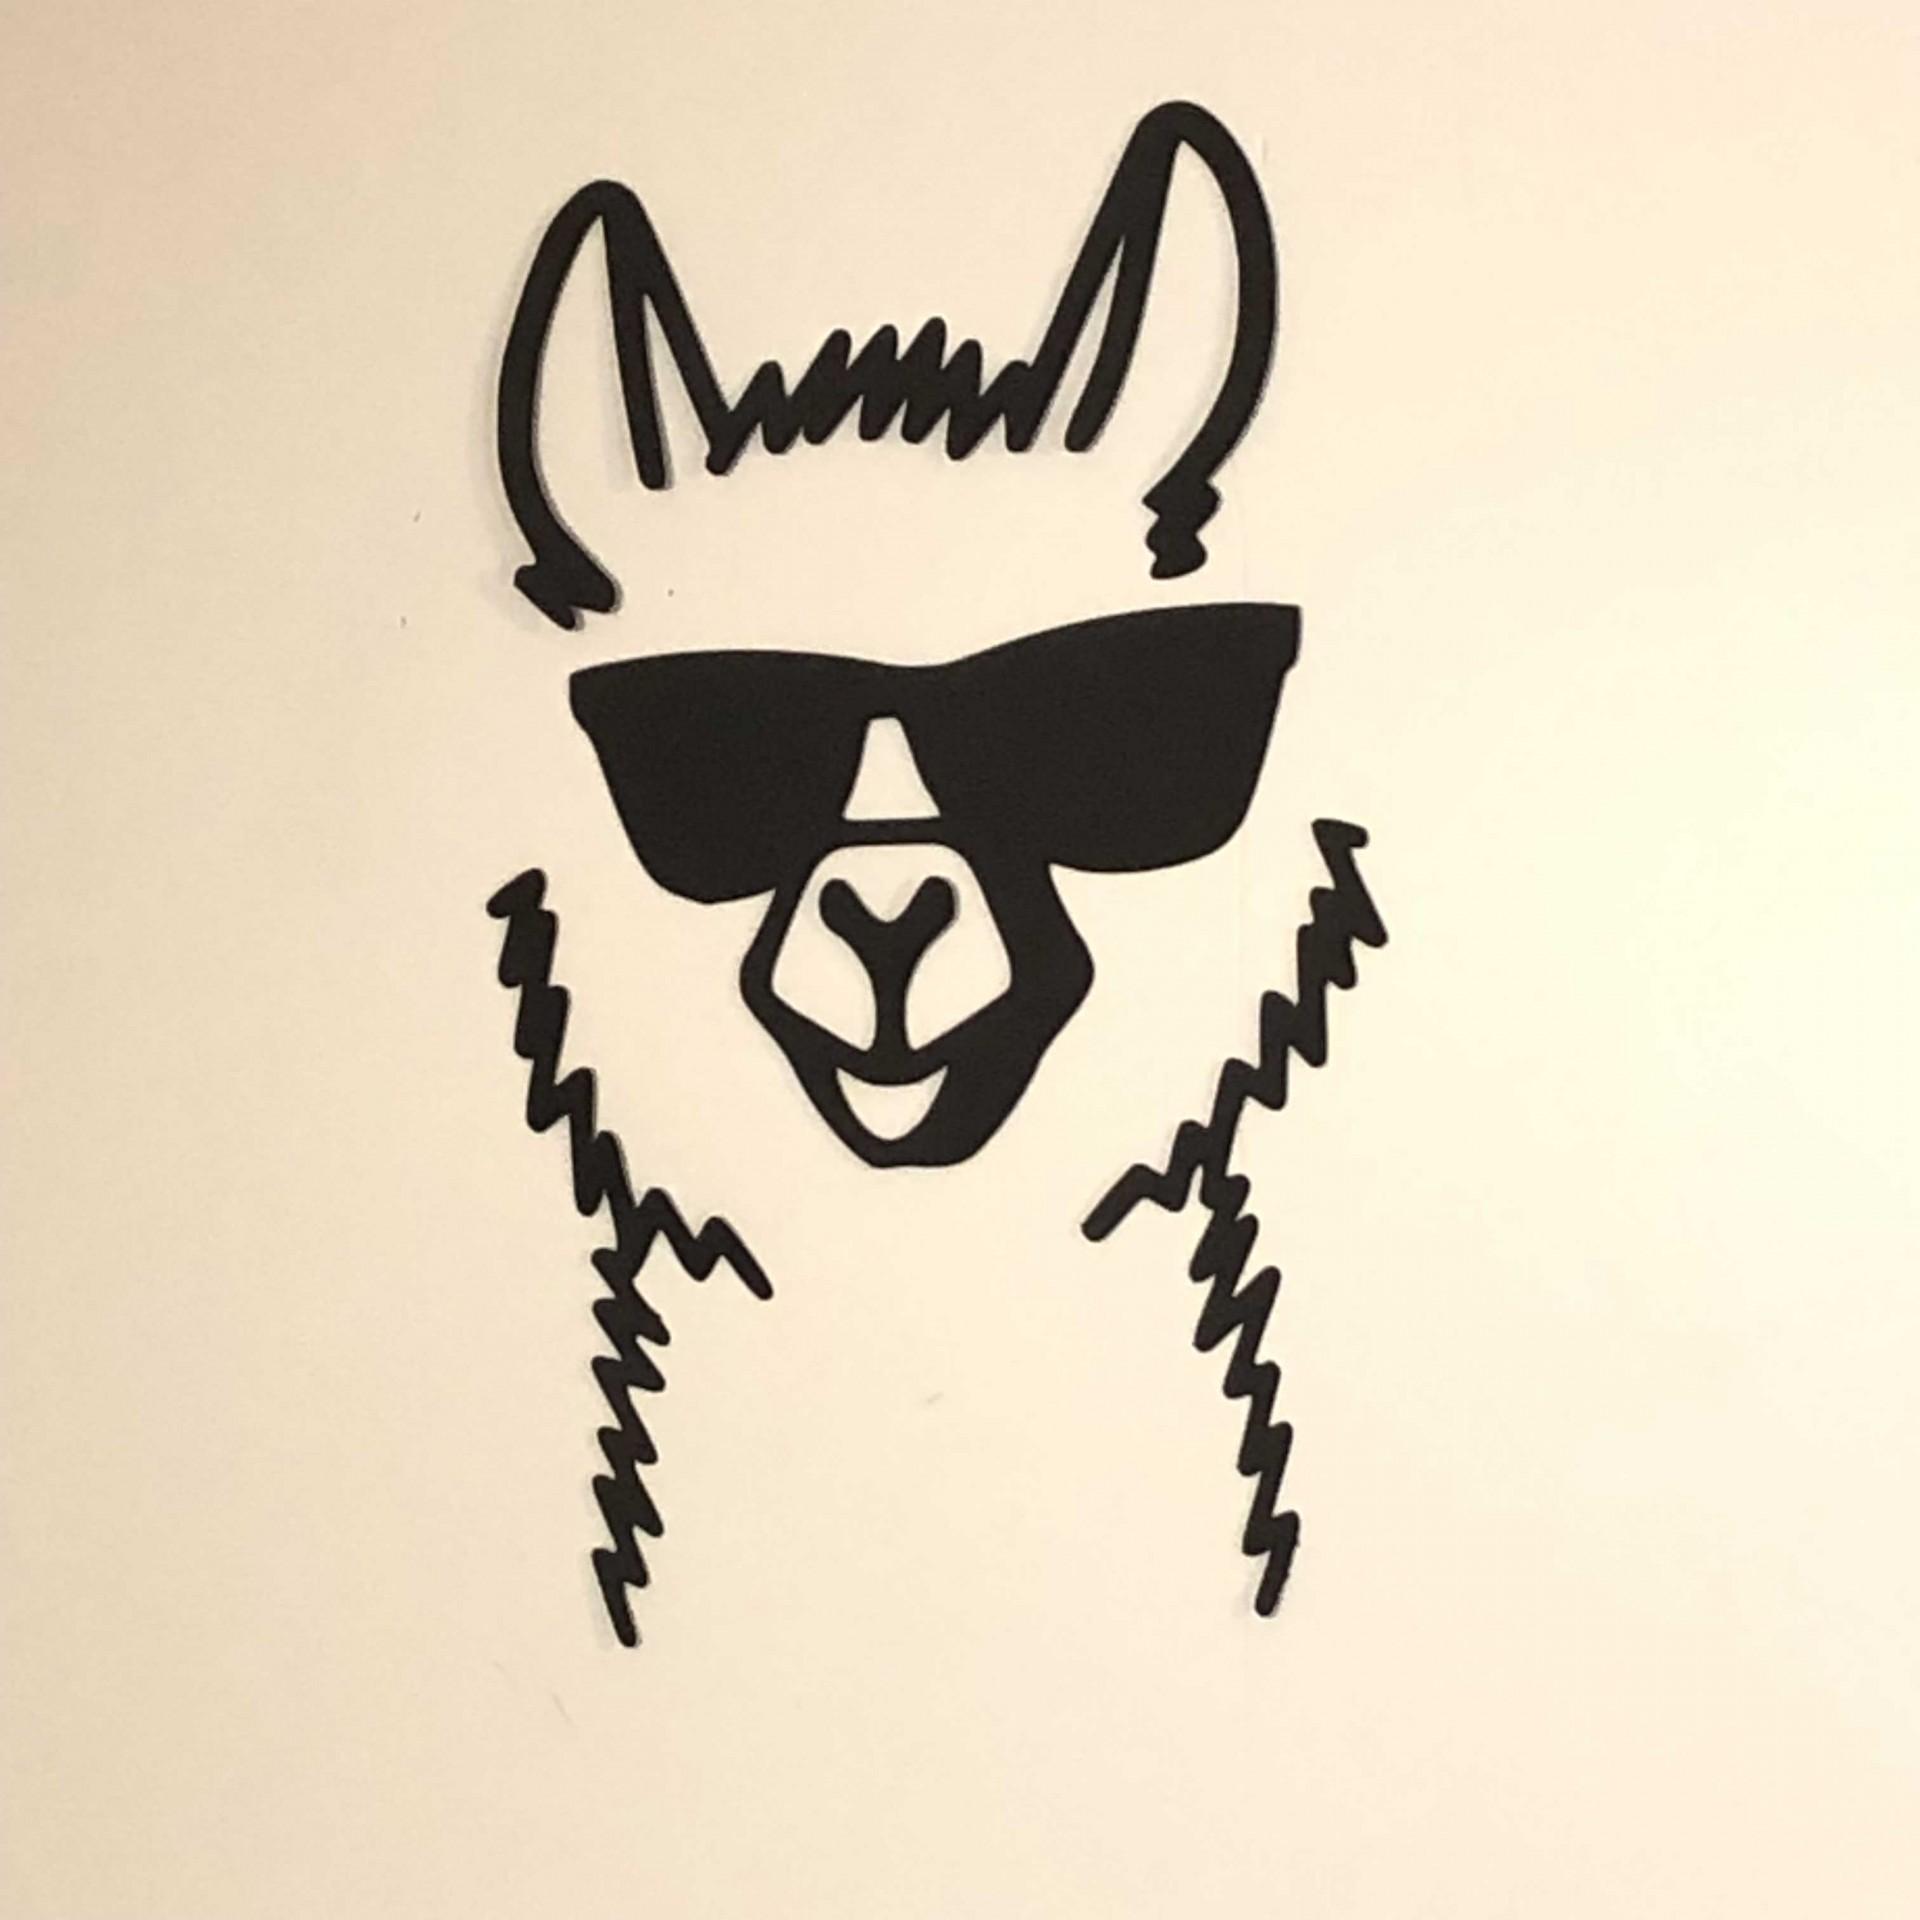 Painel Lhama ( Lama ) com óculos escuros